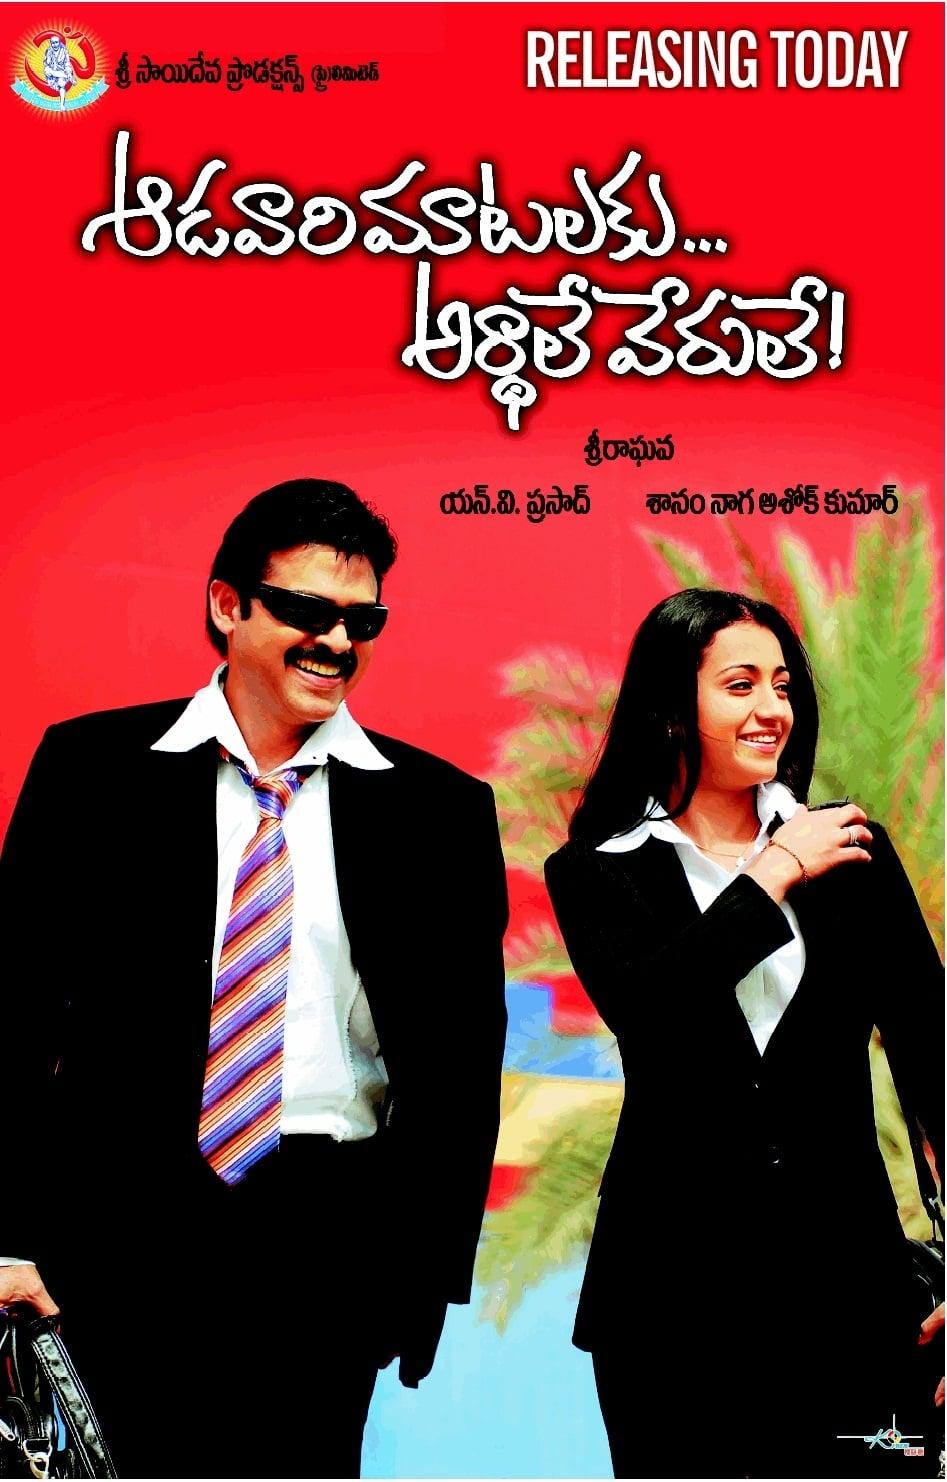 Aadavari Matalaku Ardhalu Verule Movie Streaming Online Watch on Zee5